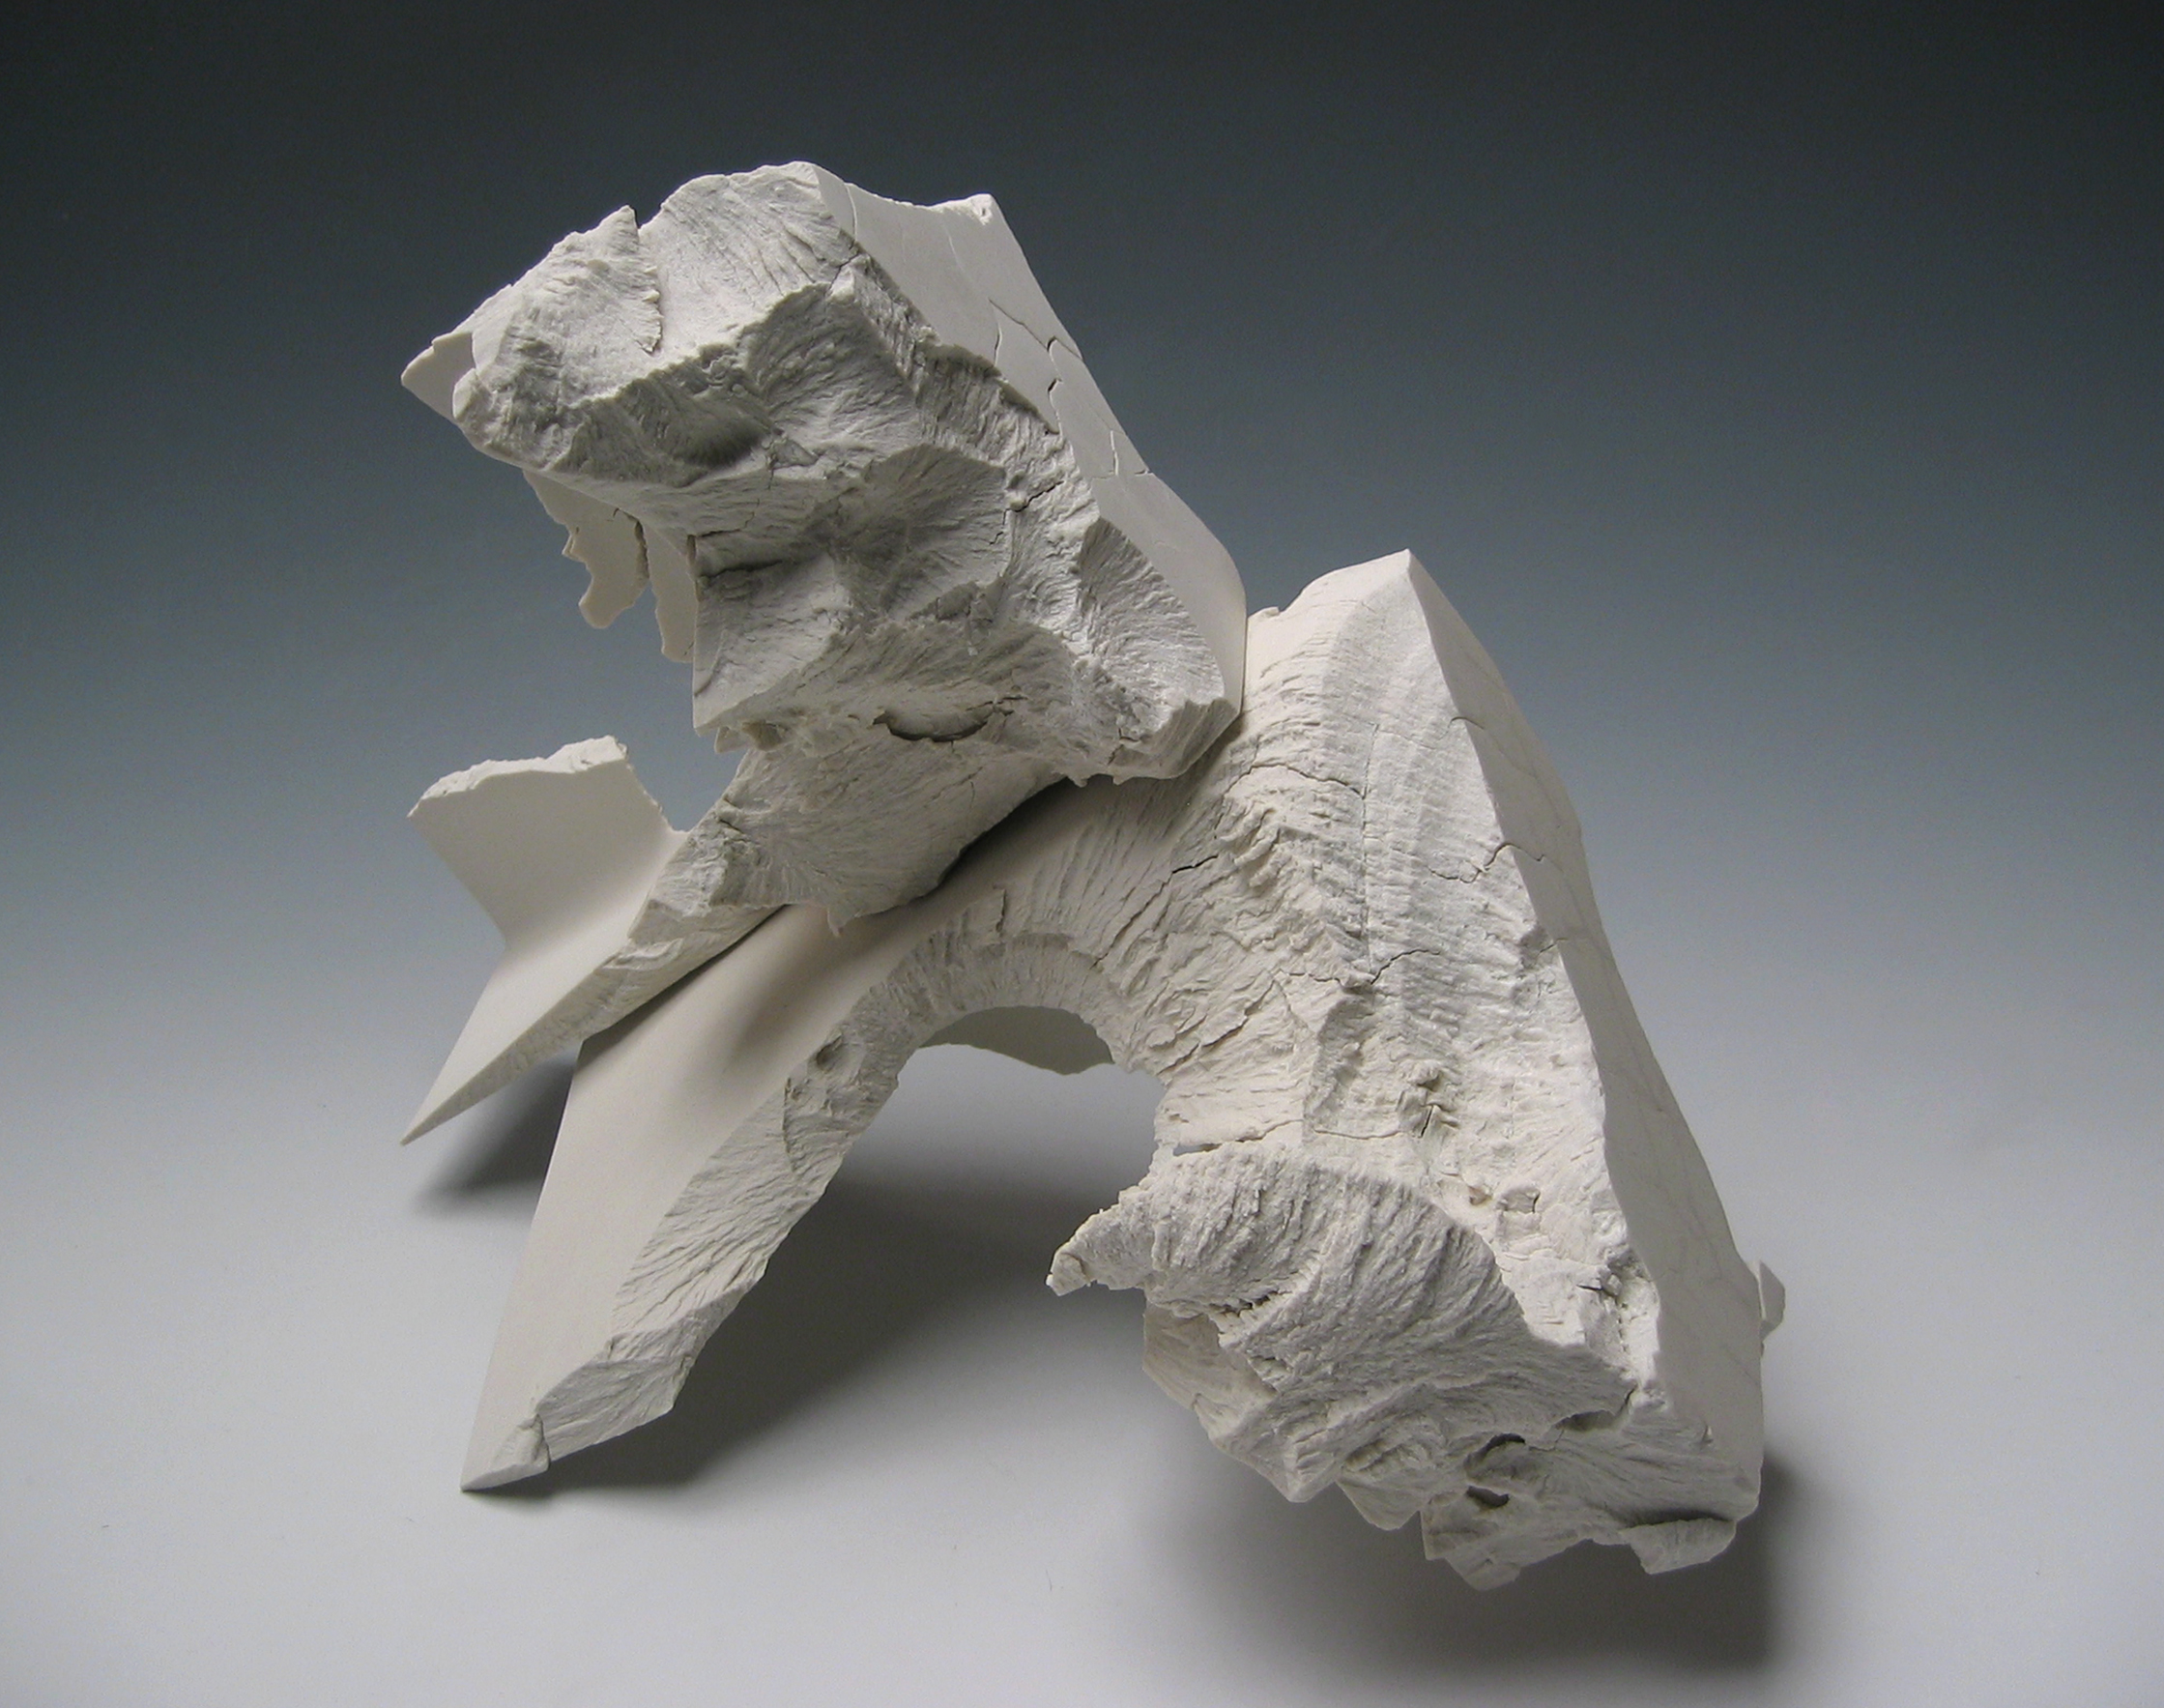 solid-cast porcelain   Solid-cast porcelain